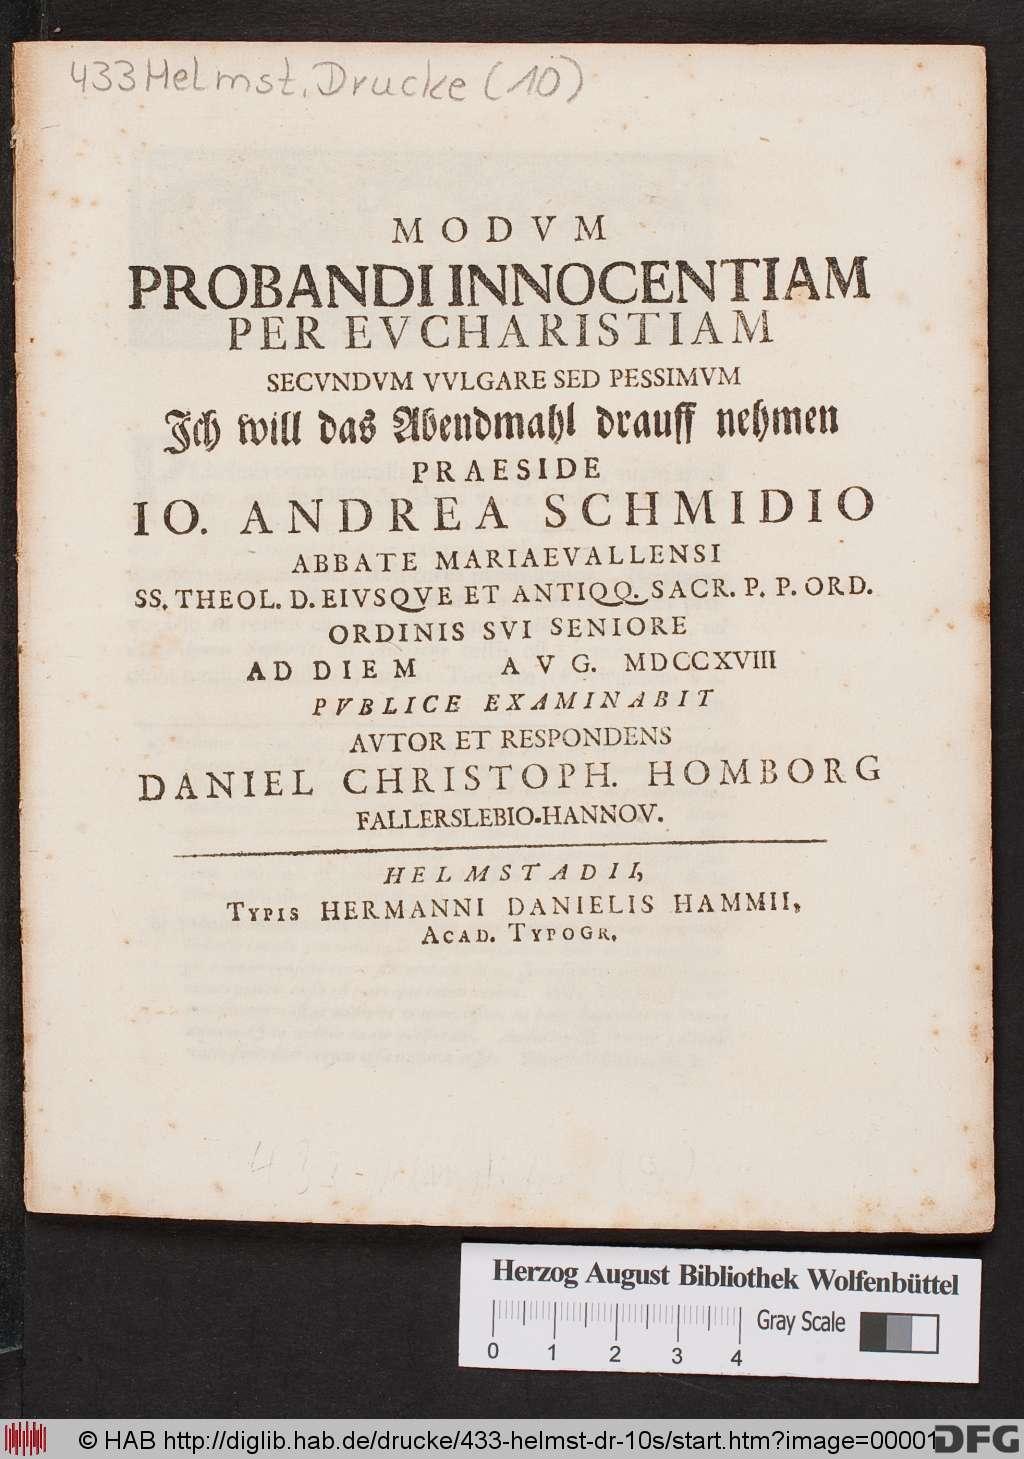 http://diglib.hab.de/drucke/433-helmst-dr-10s/00001.jpg